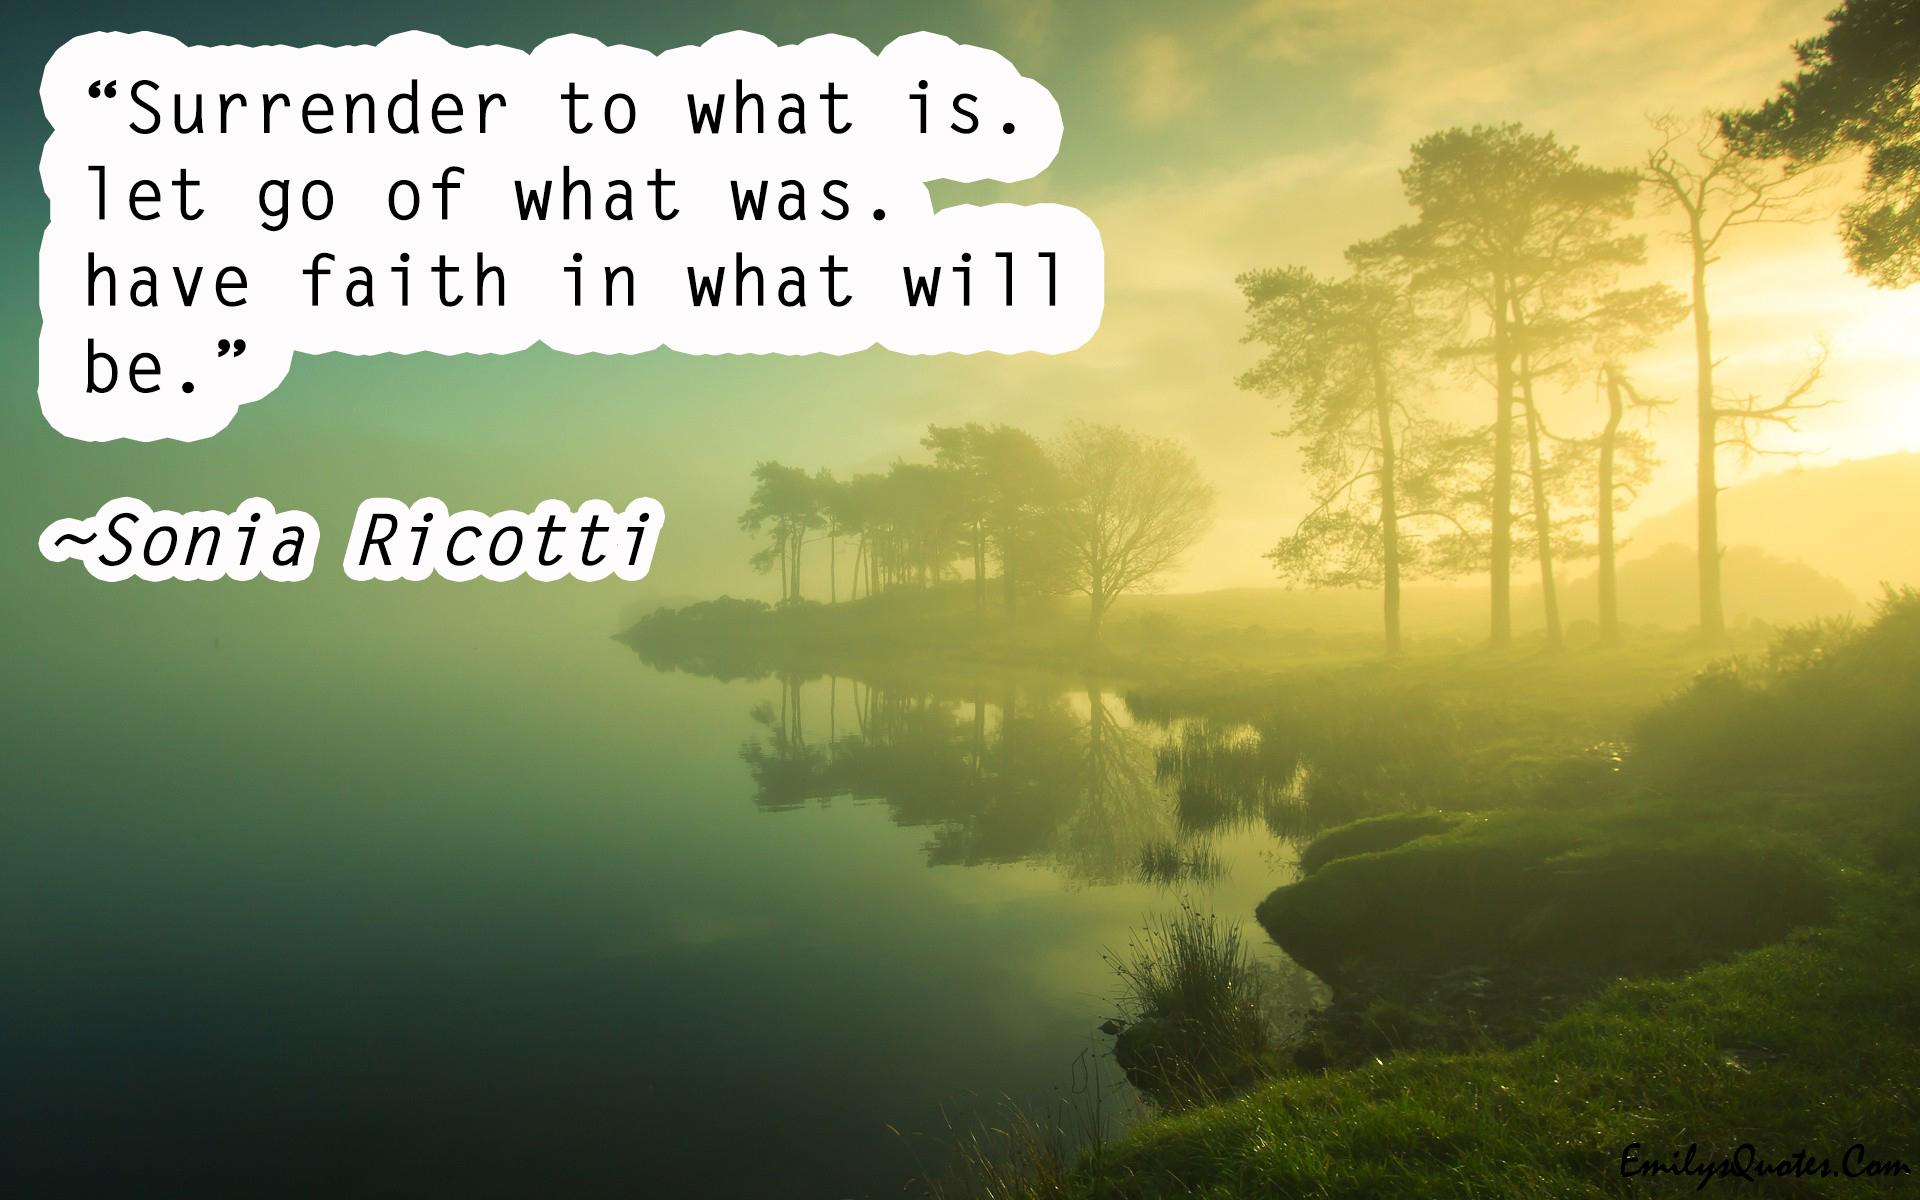 EmilysQuotes.Com - faith, positive, wisdom, change, Sonia Ricotti